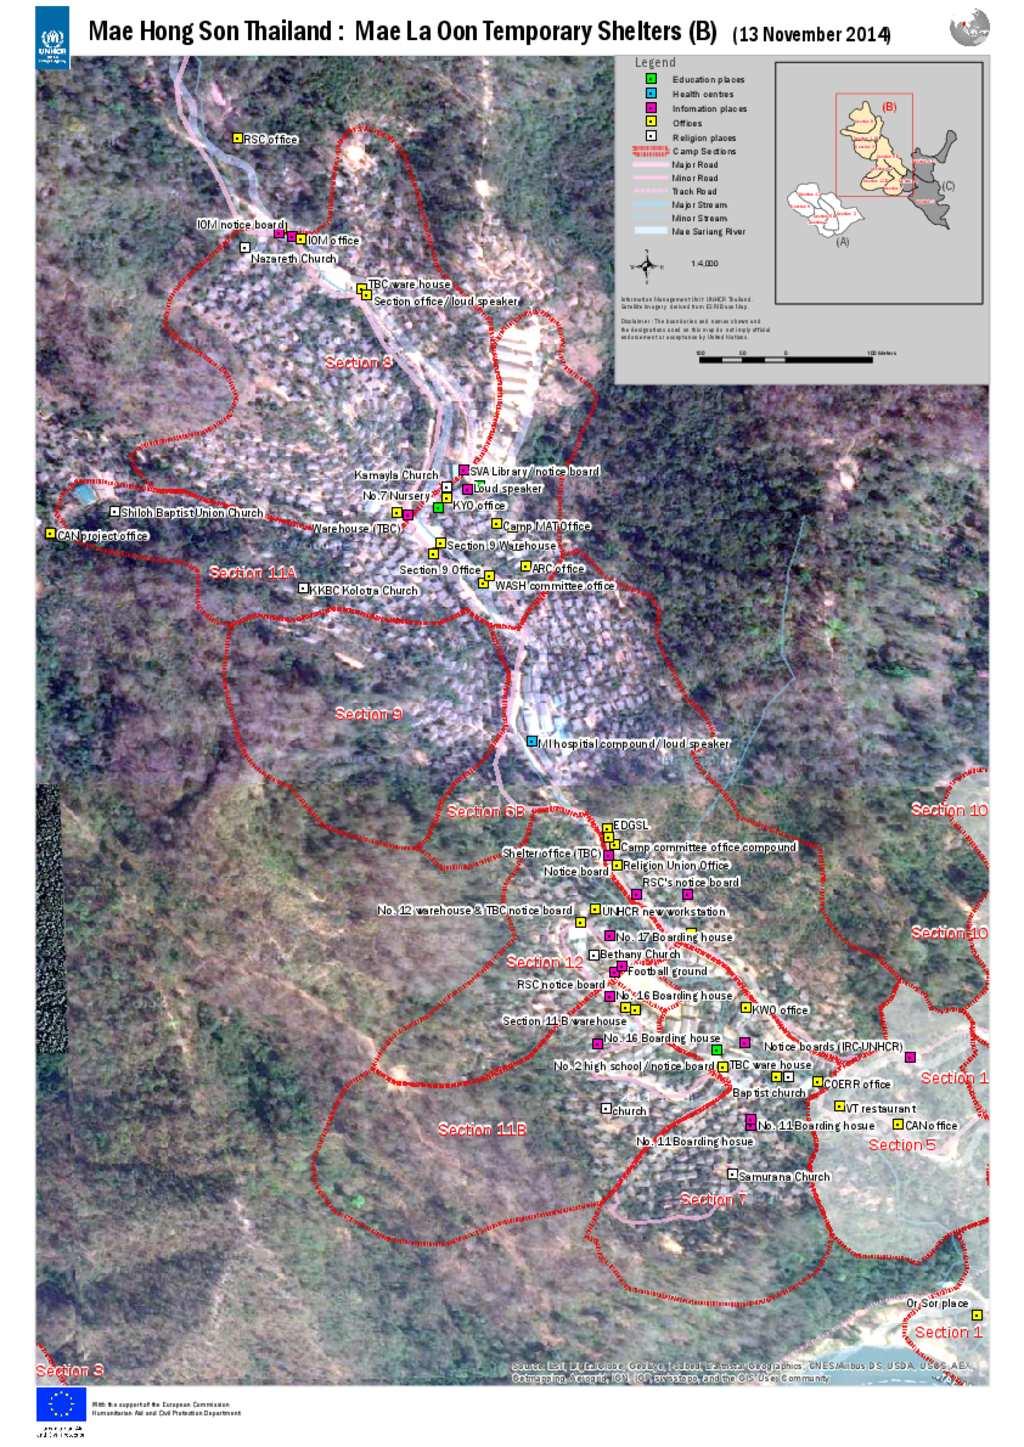 Document - Information Dissemination Map B Mae La Oon ...